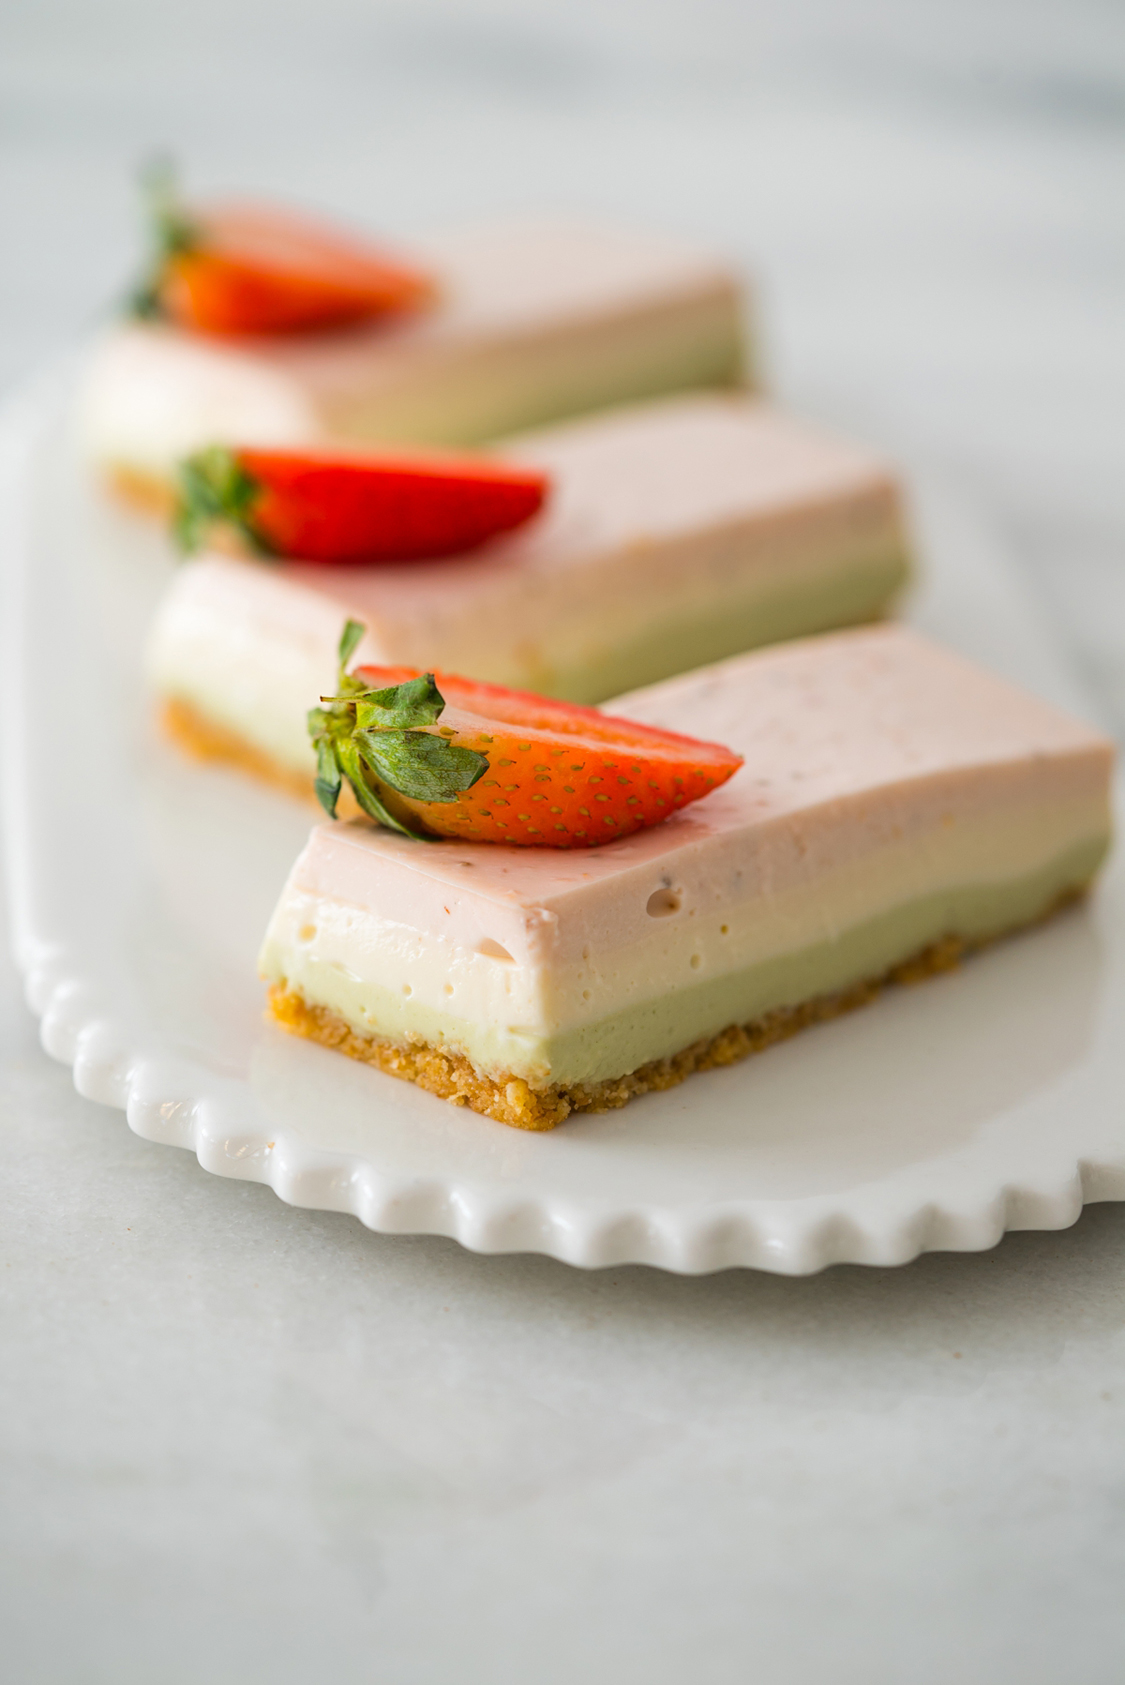 Cheesecake de matcha, baunilha e morango